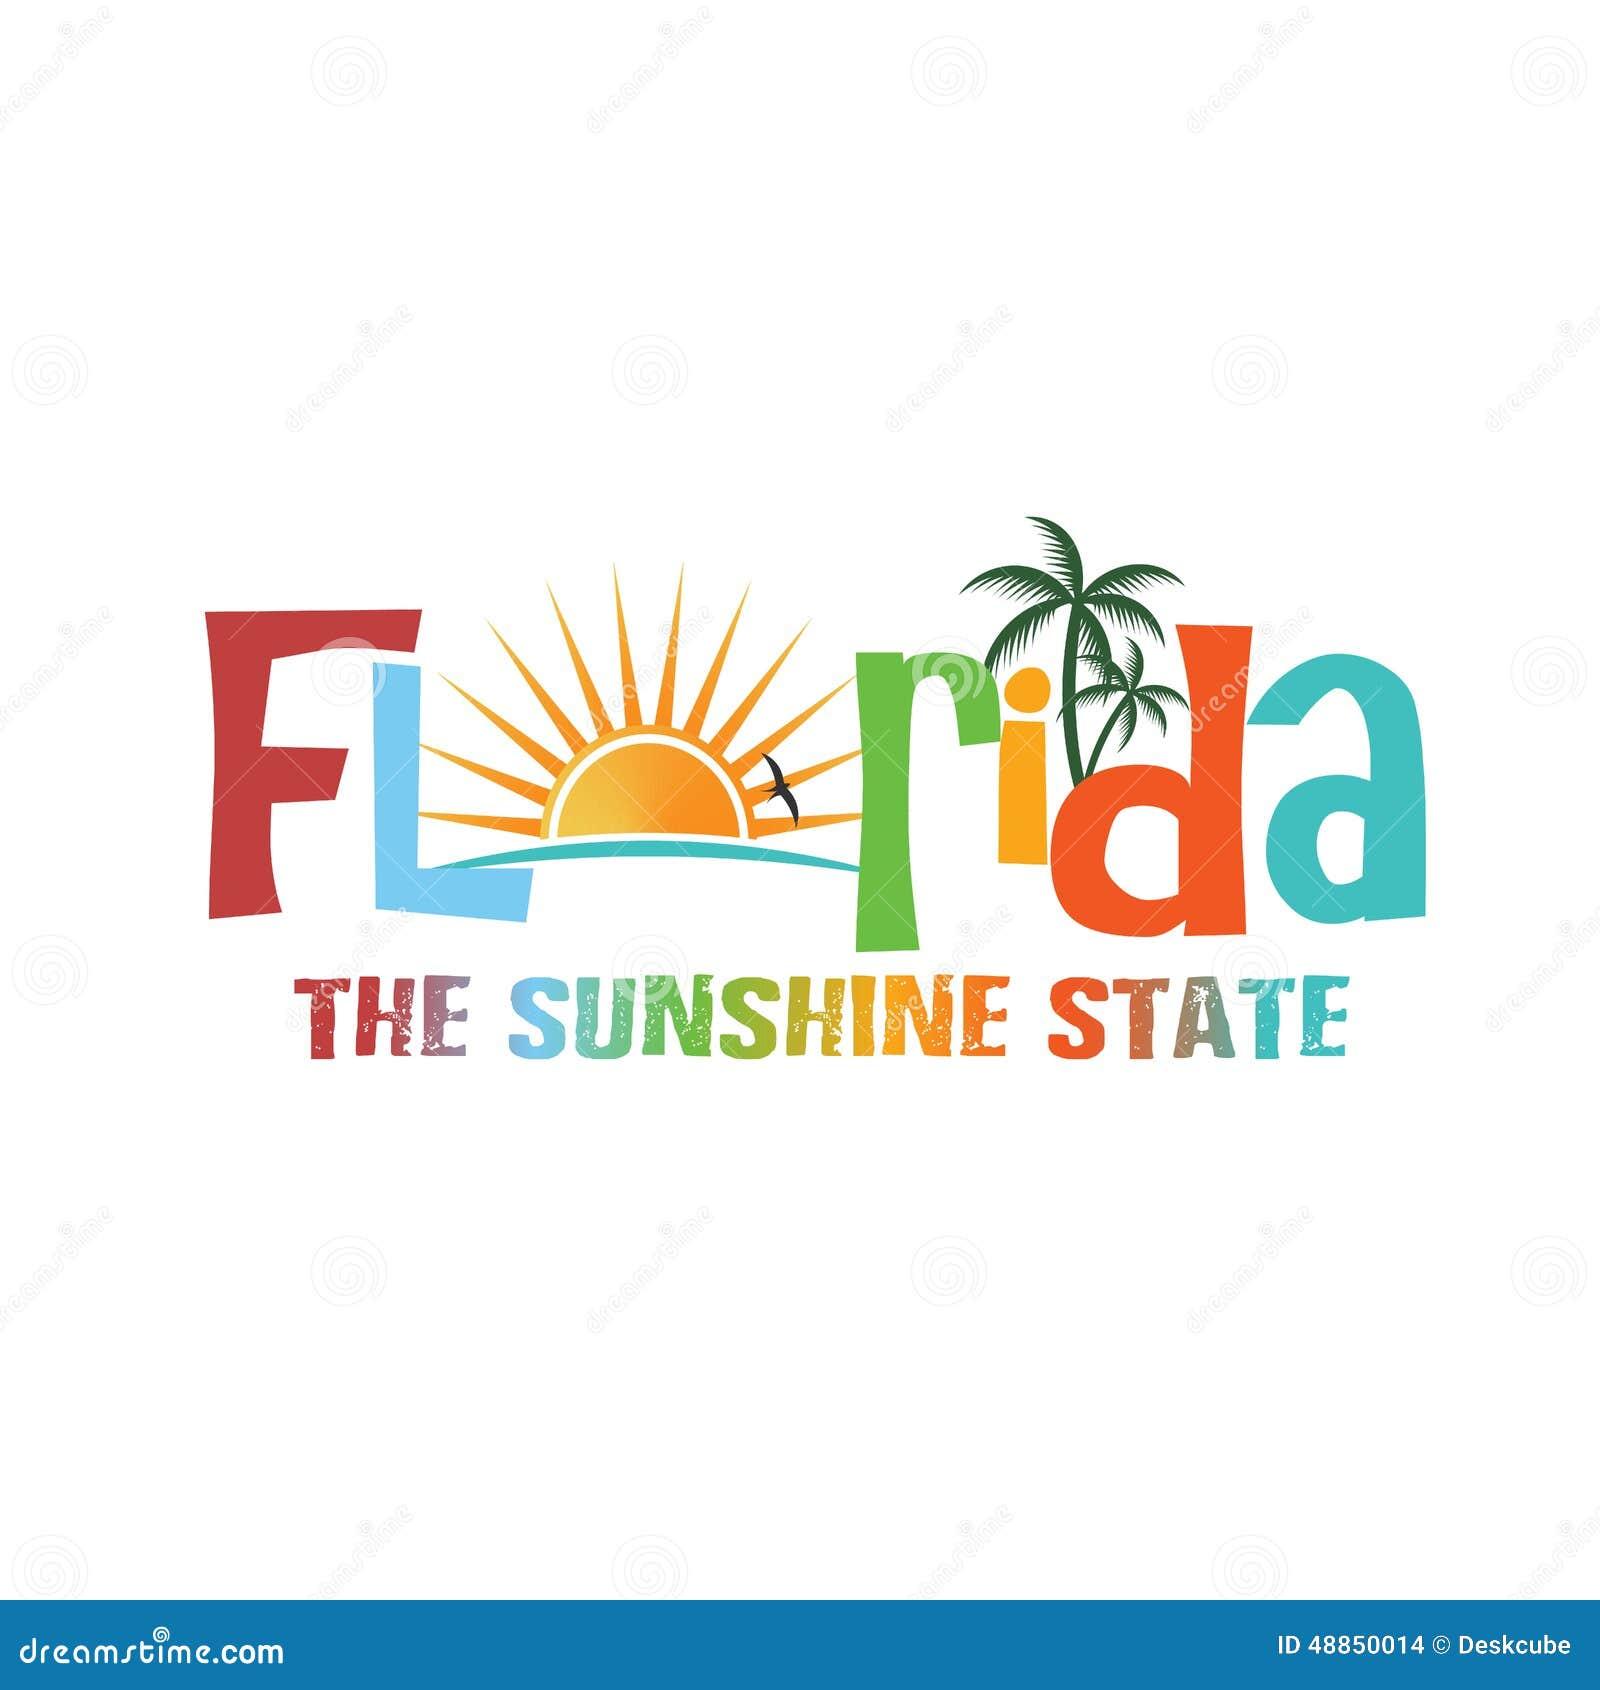 Florida Wording Theme Stock Vector - Image: 48850014